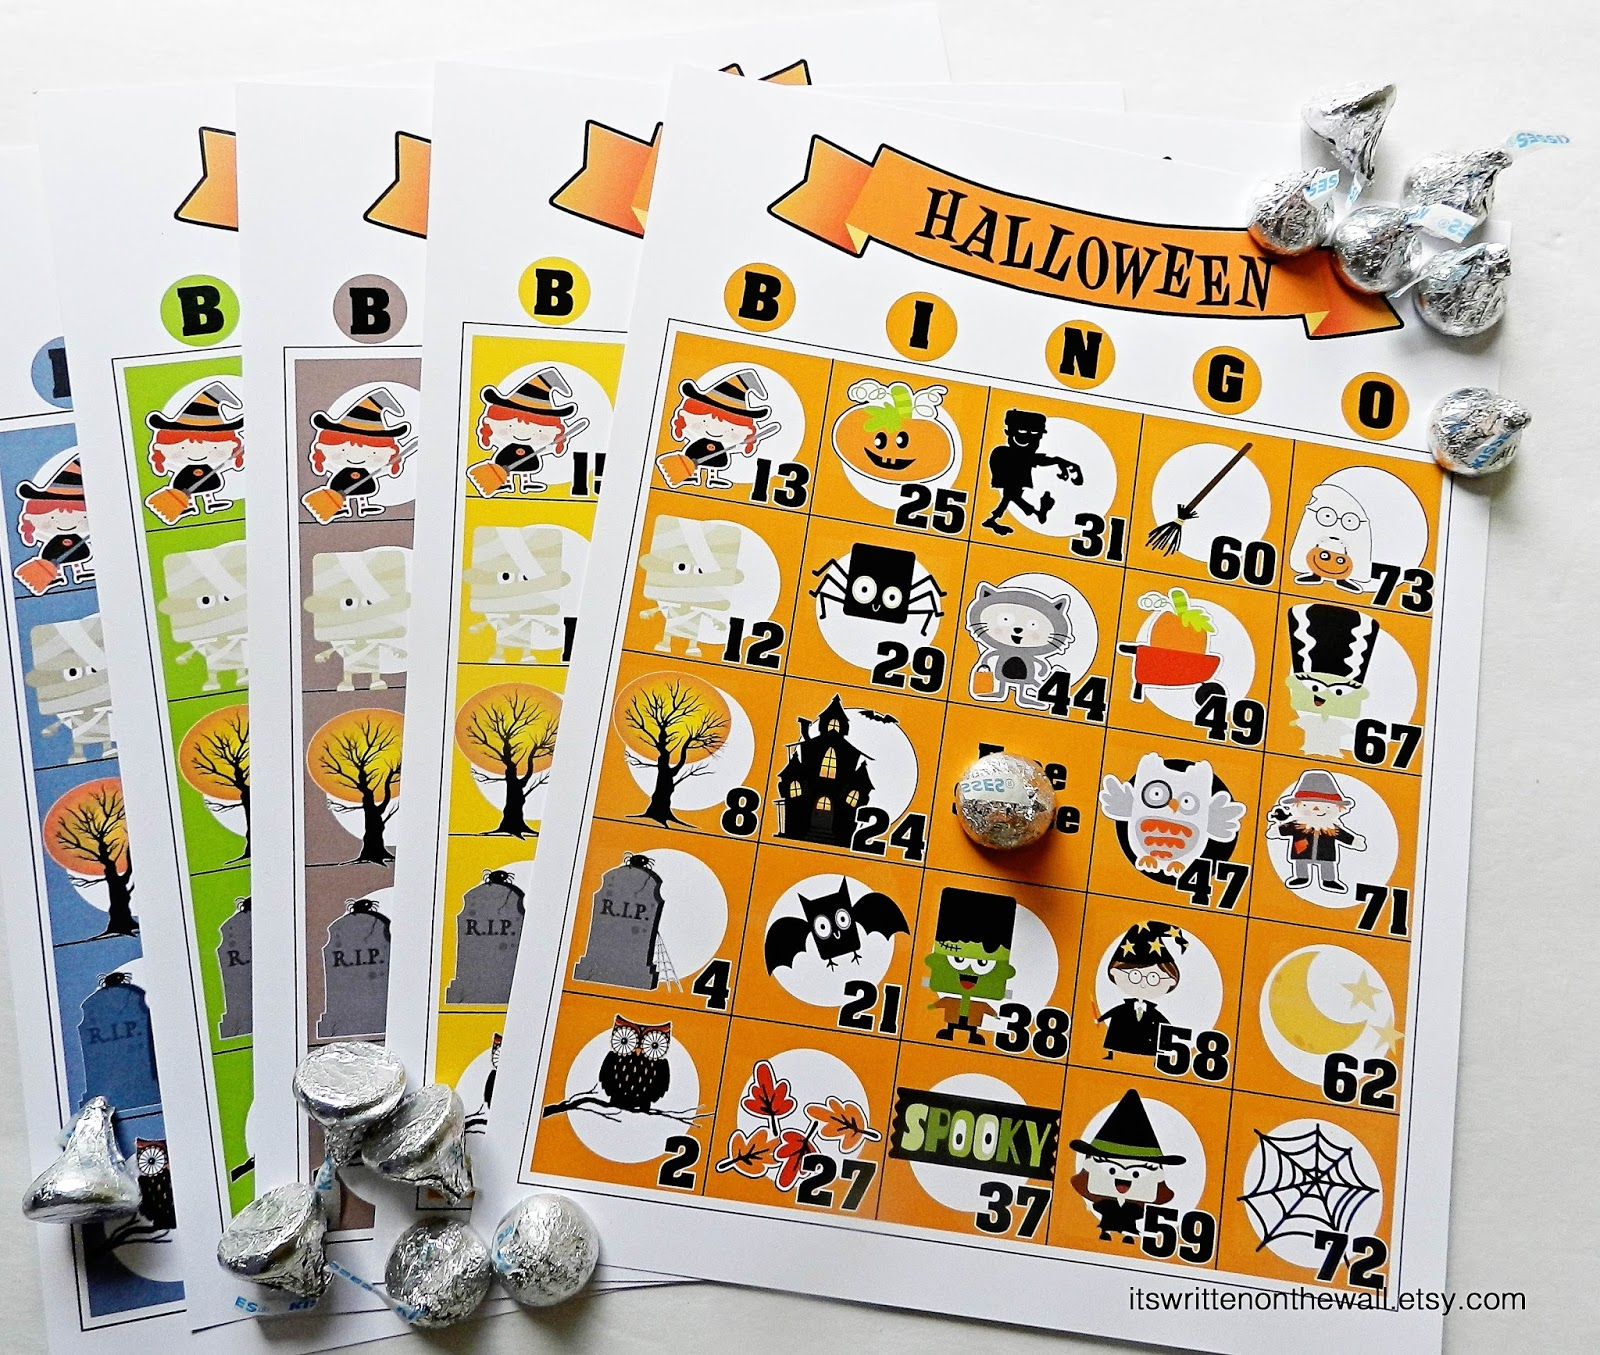 It's Written on the Wall: Brand New Halloween Bingo Games ...